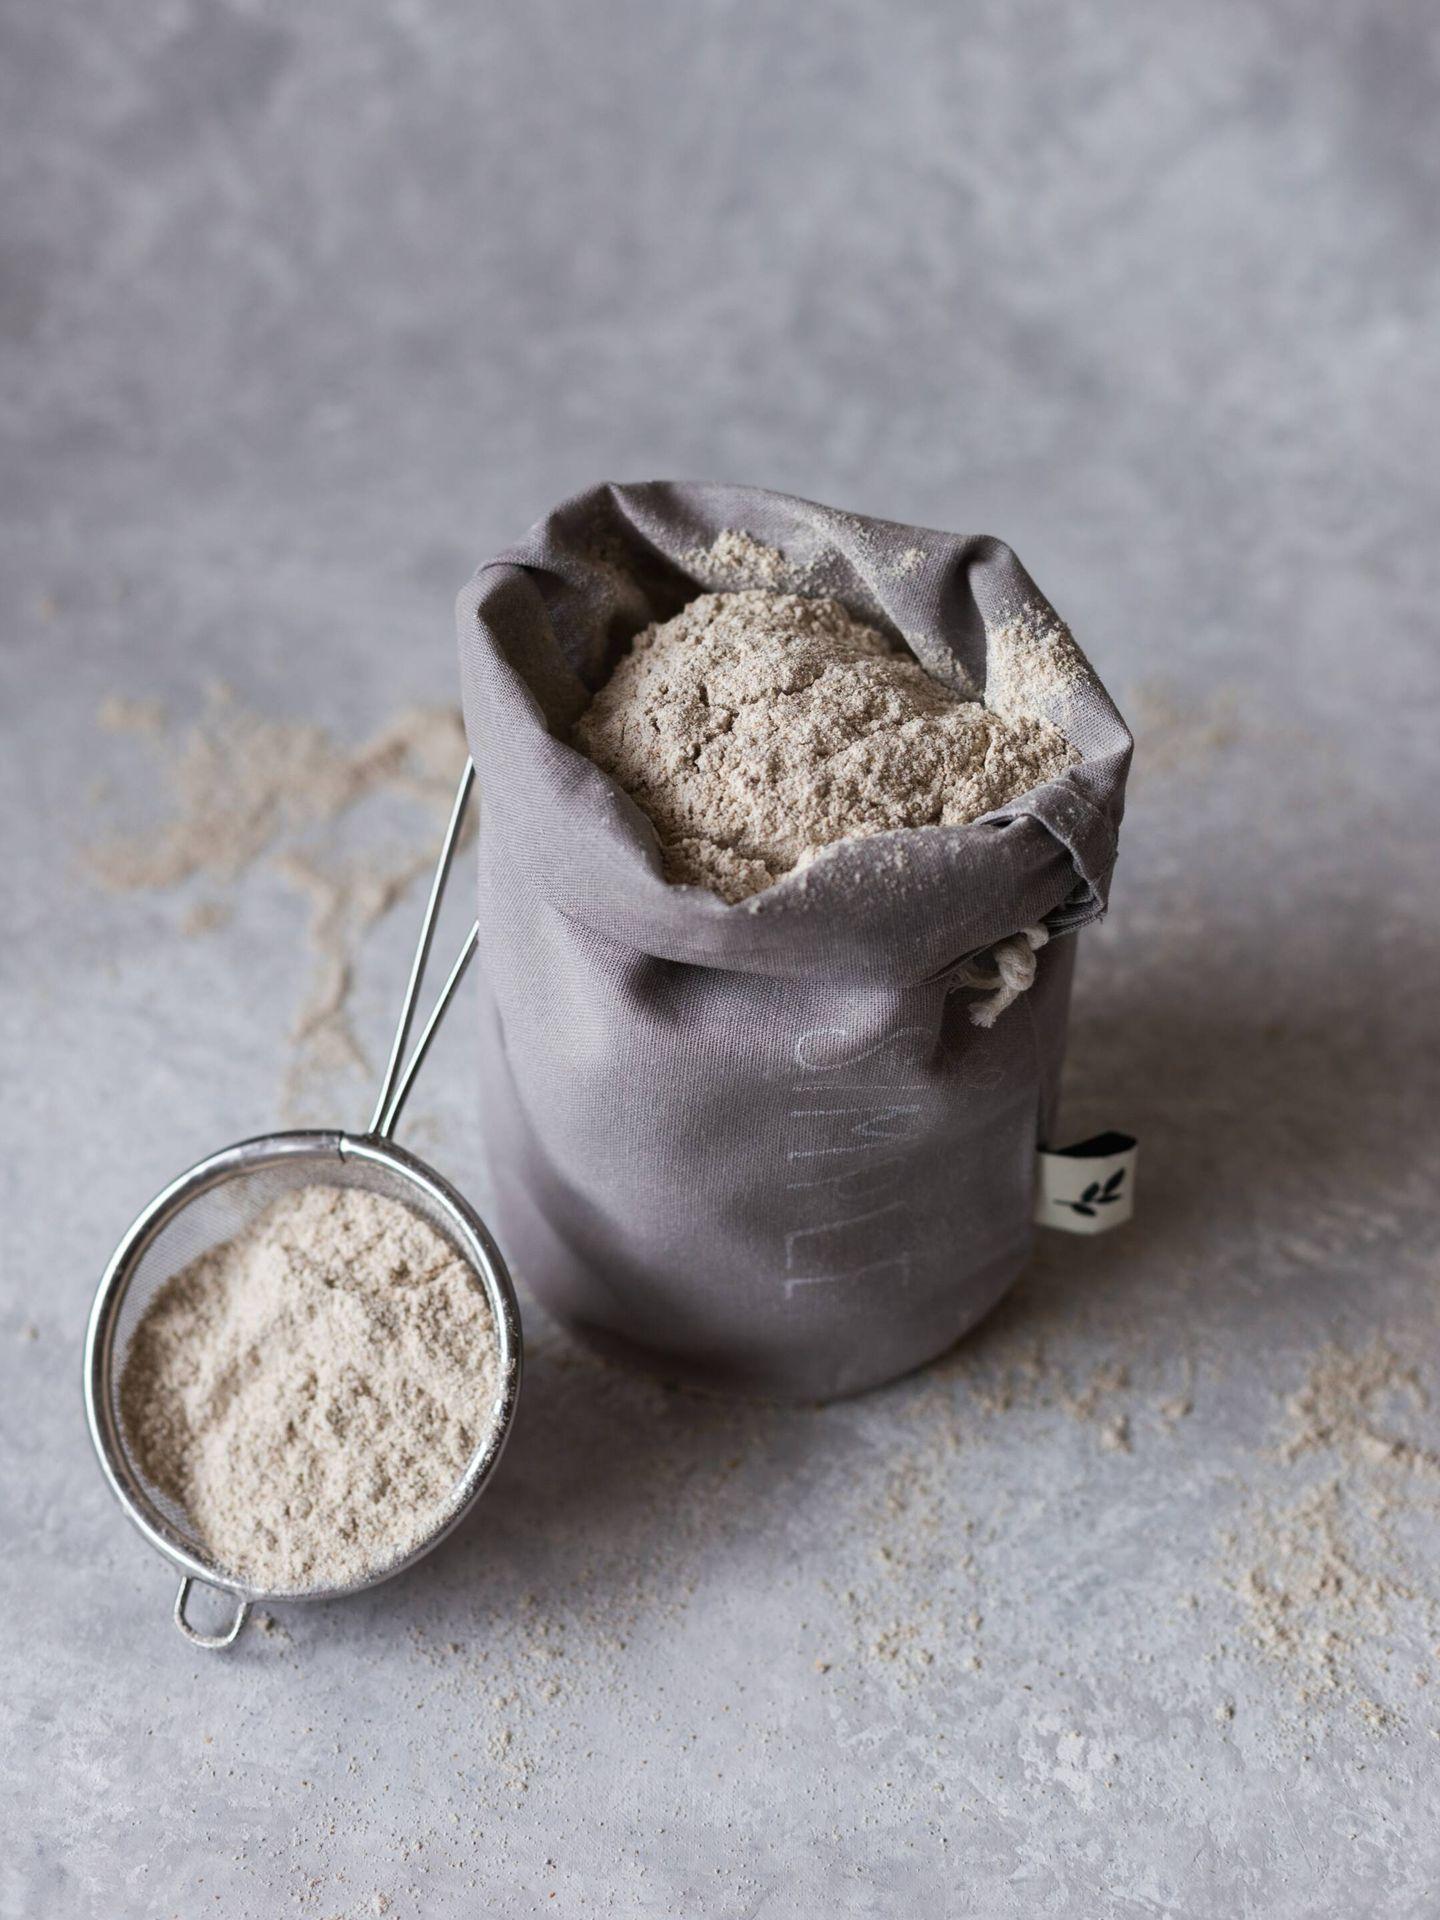 Semillas de lino para perder peso. (Olga Kudriavtseva para Unsplash)